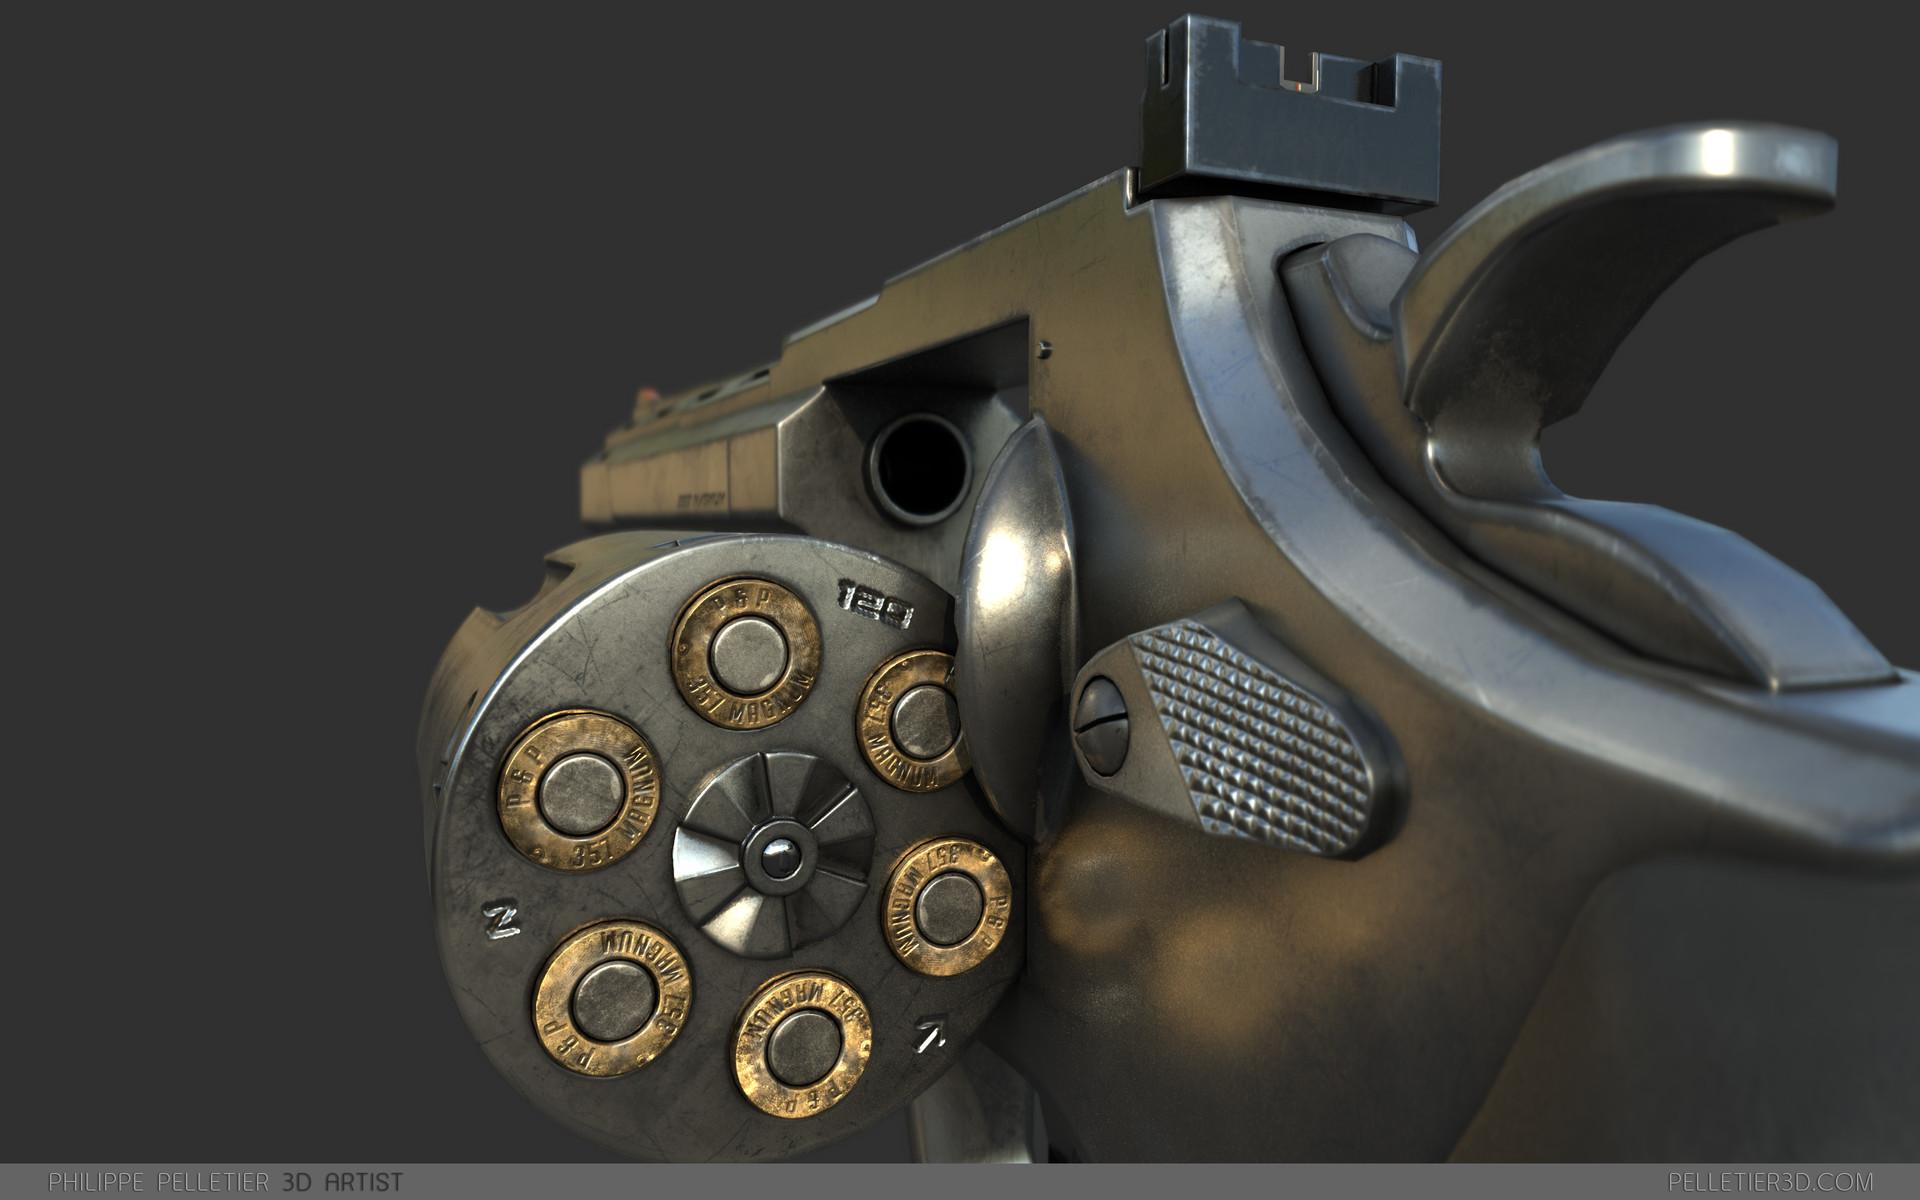 Philippe pelletier revolver 008